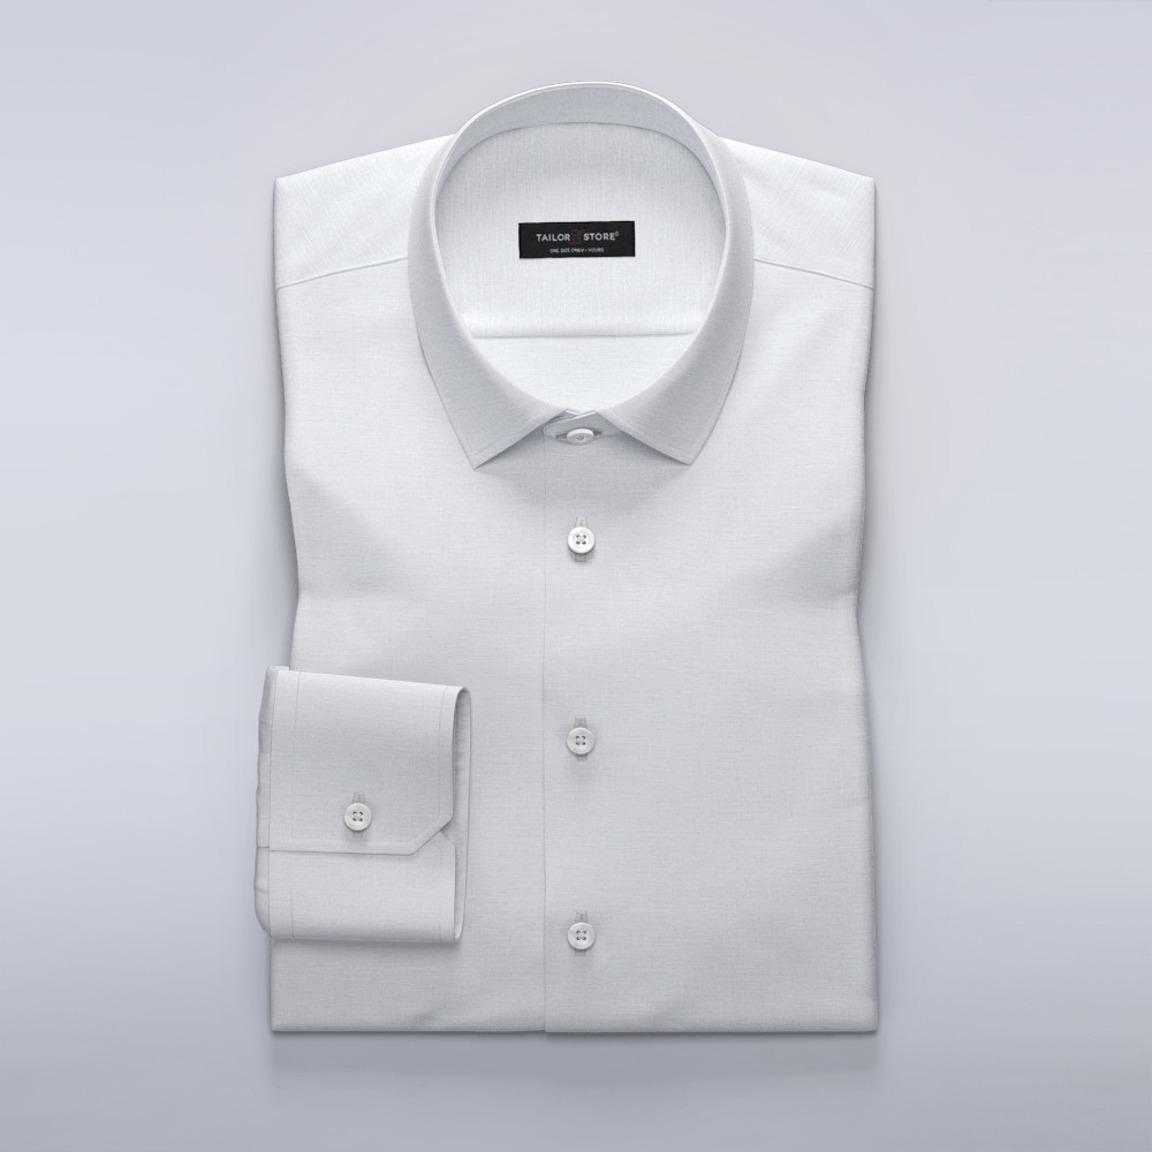 Women's dress shirt in white linen